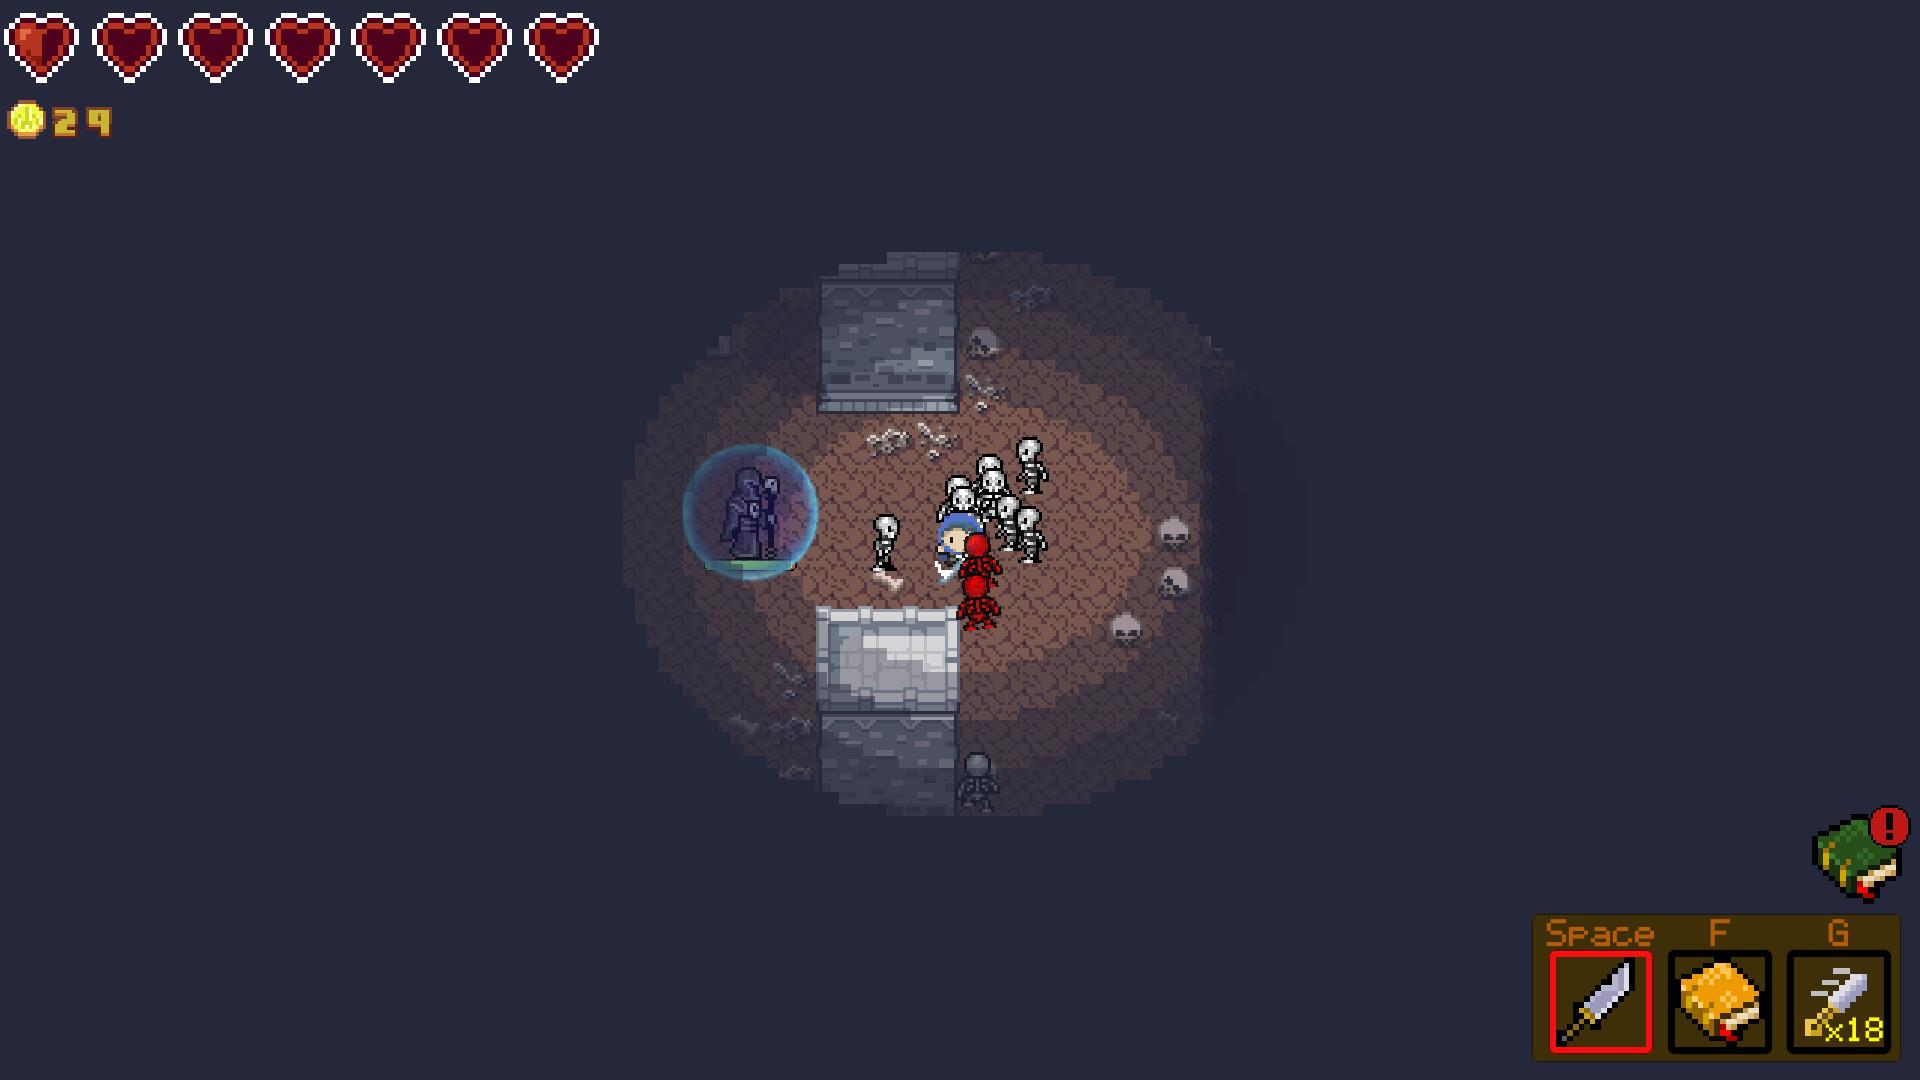 How To Make A Killing screenshot